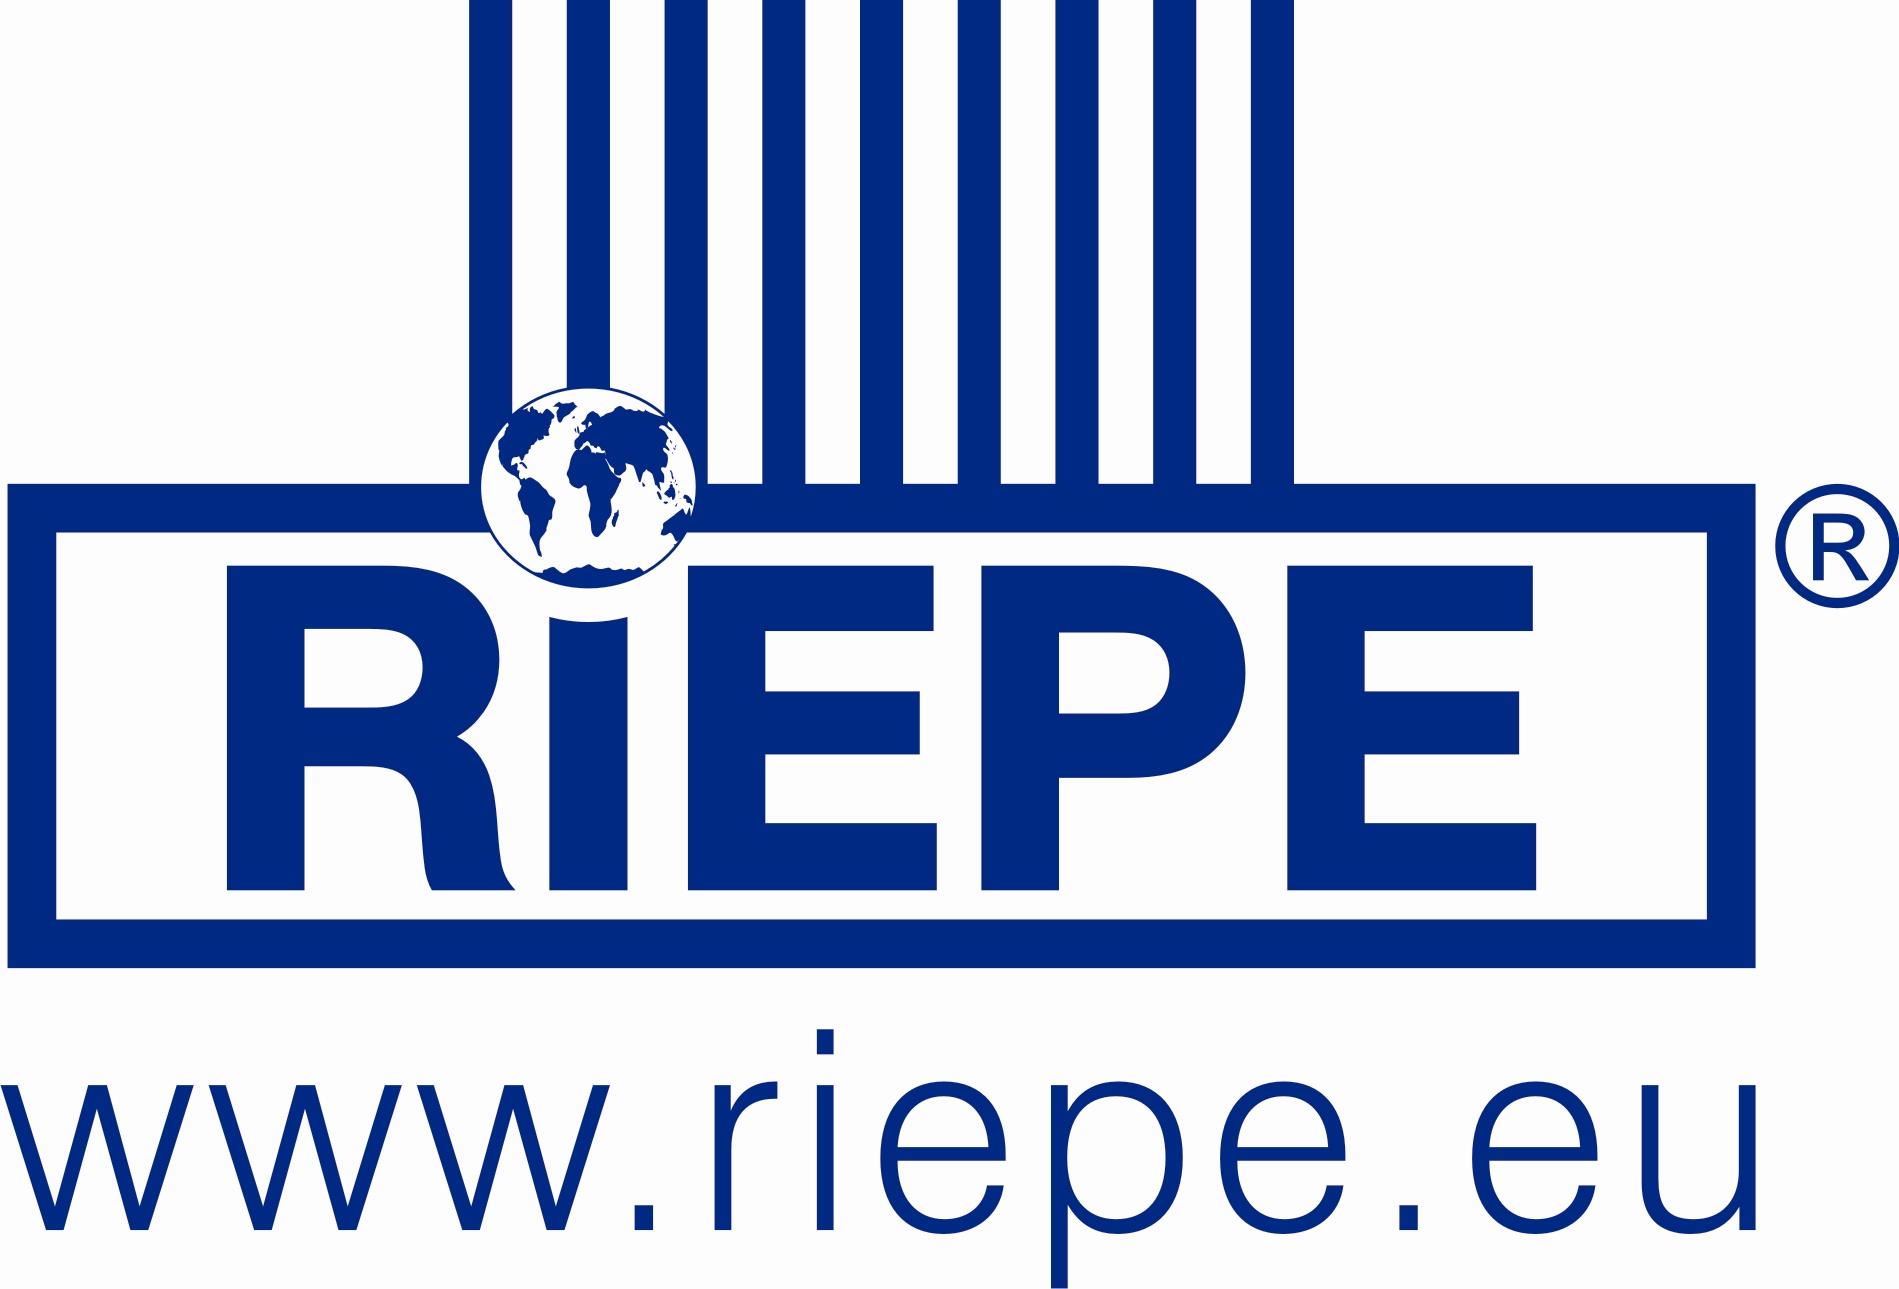 RIEPE logo